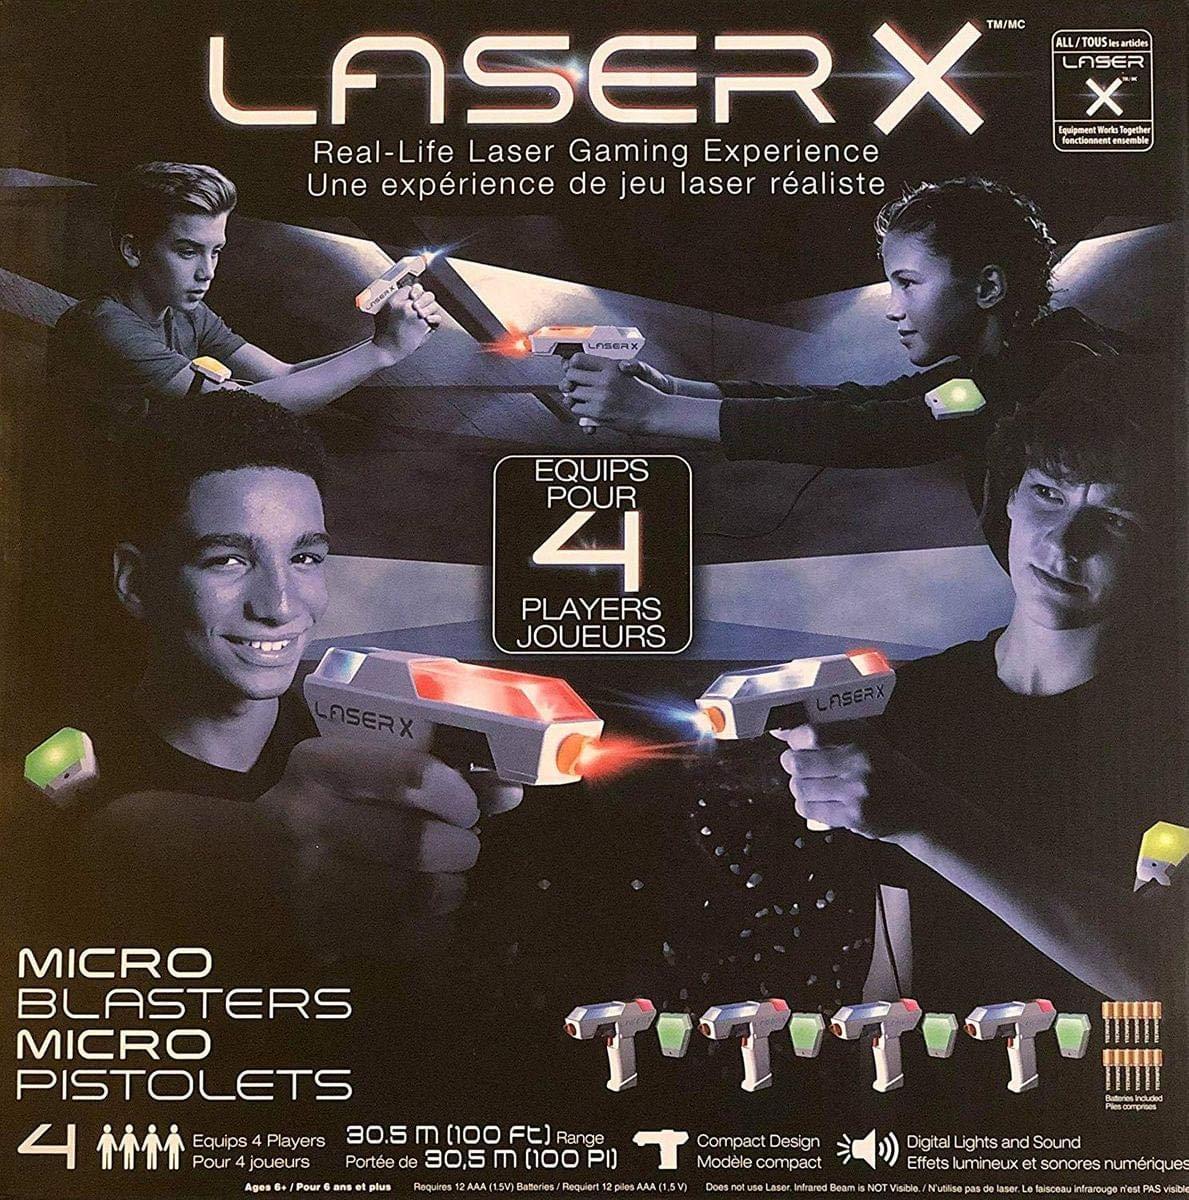 Laser X Micro Blasters 4-Pack Laser Gaming